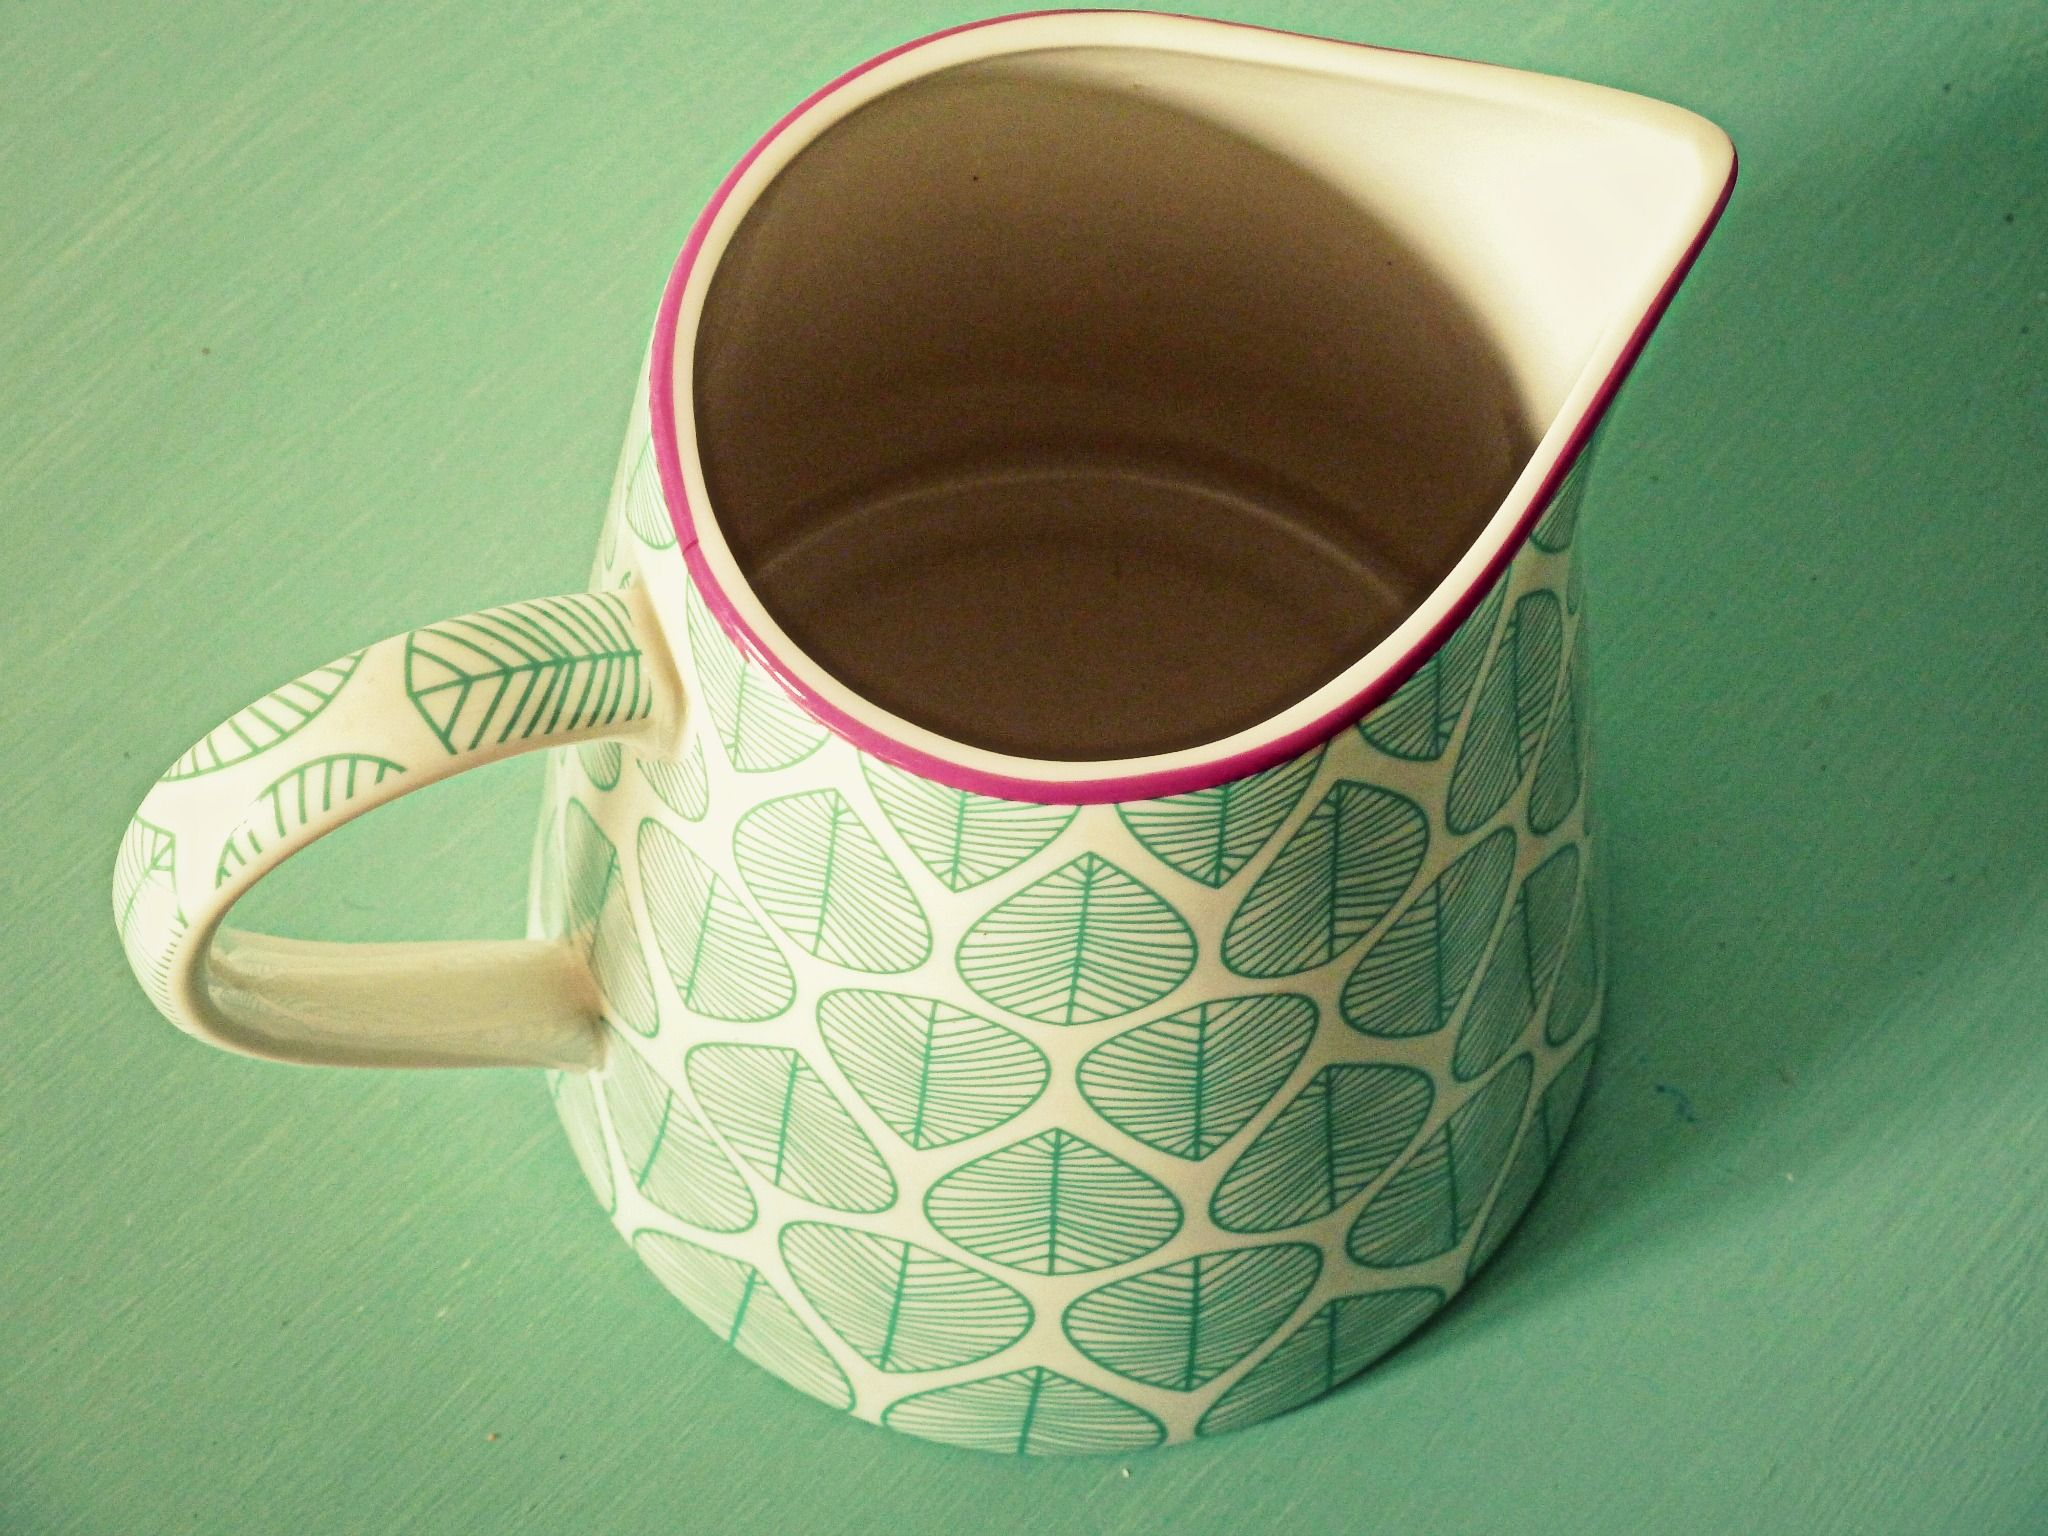 Aspegren Leaf jug